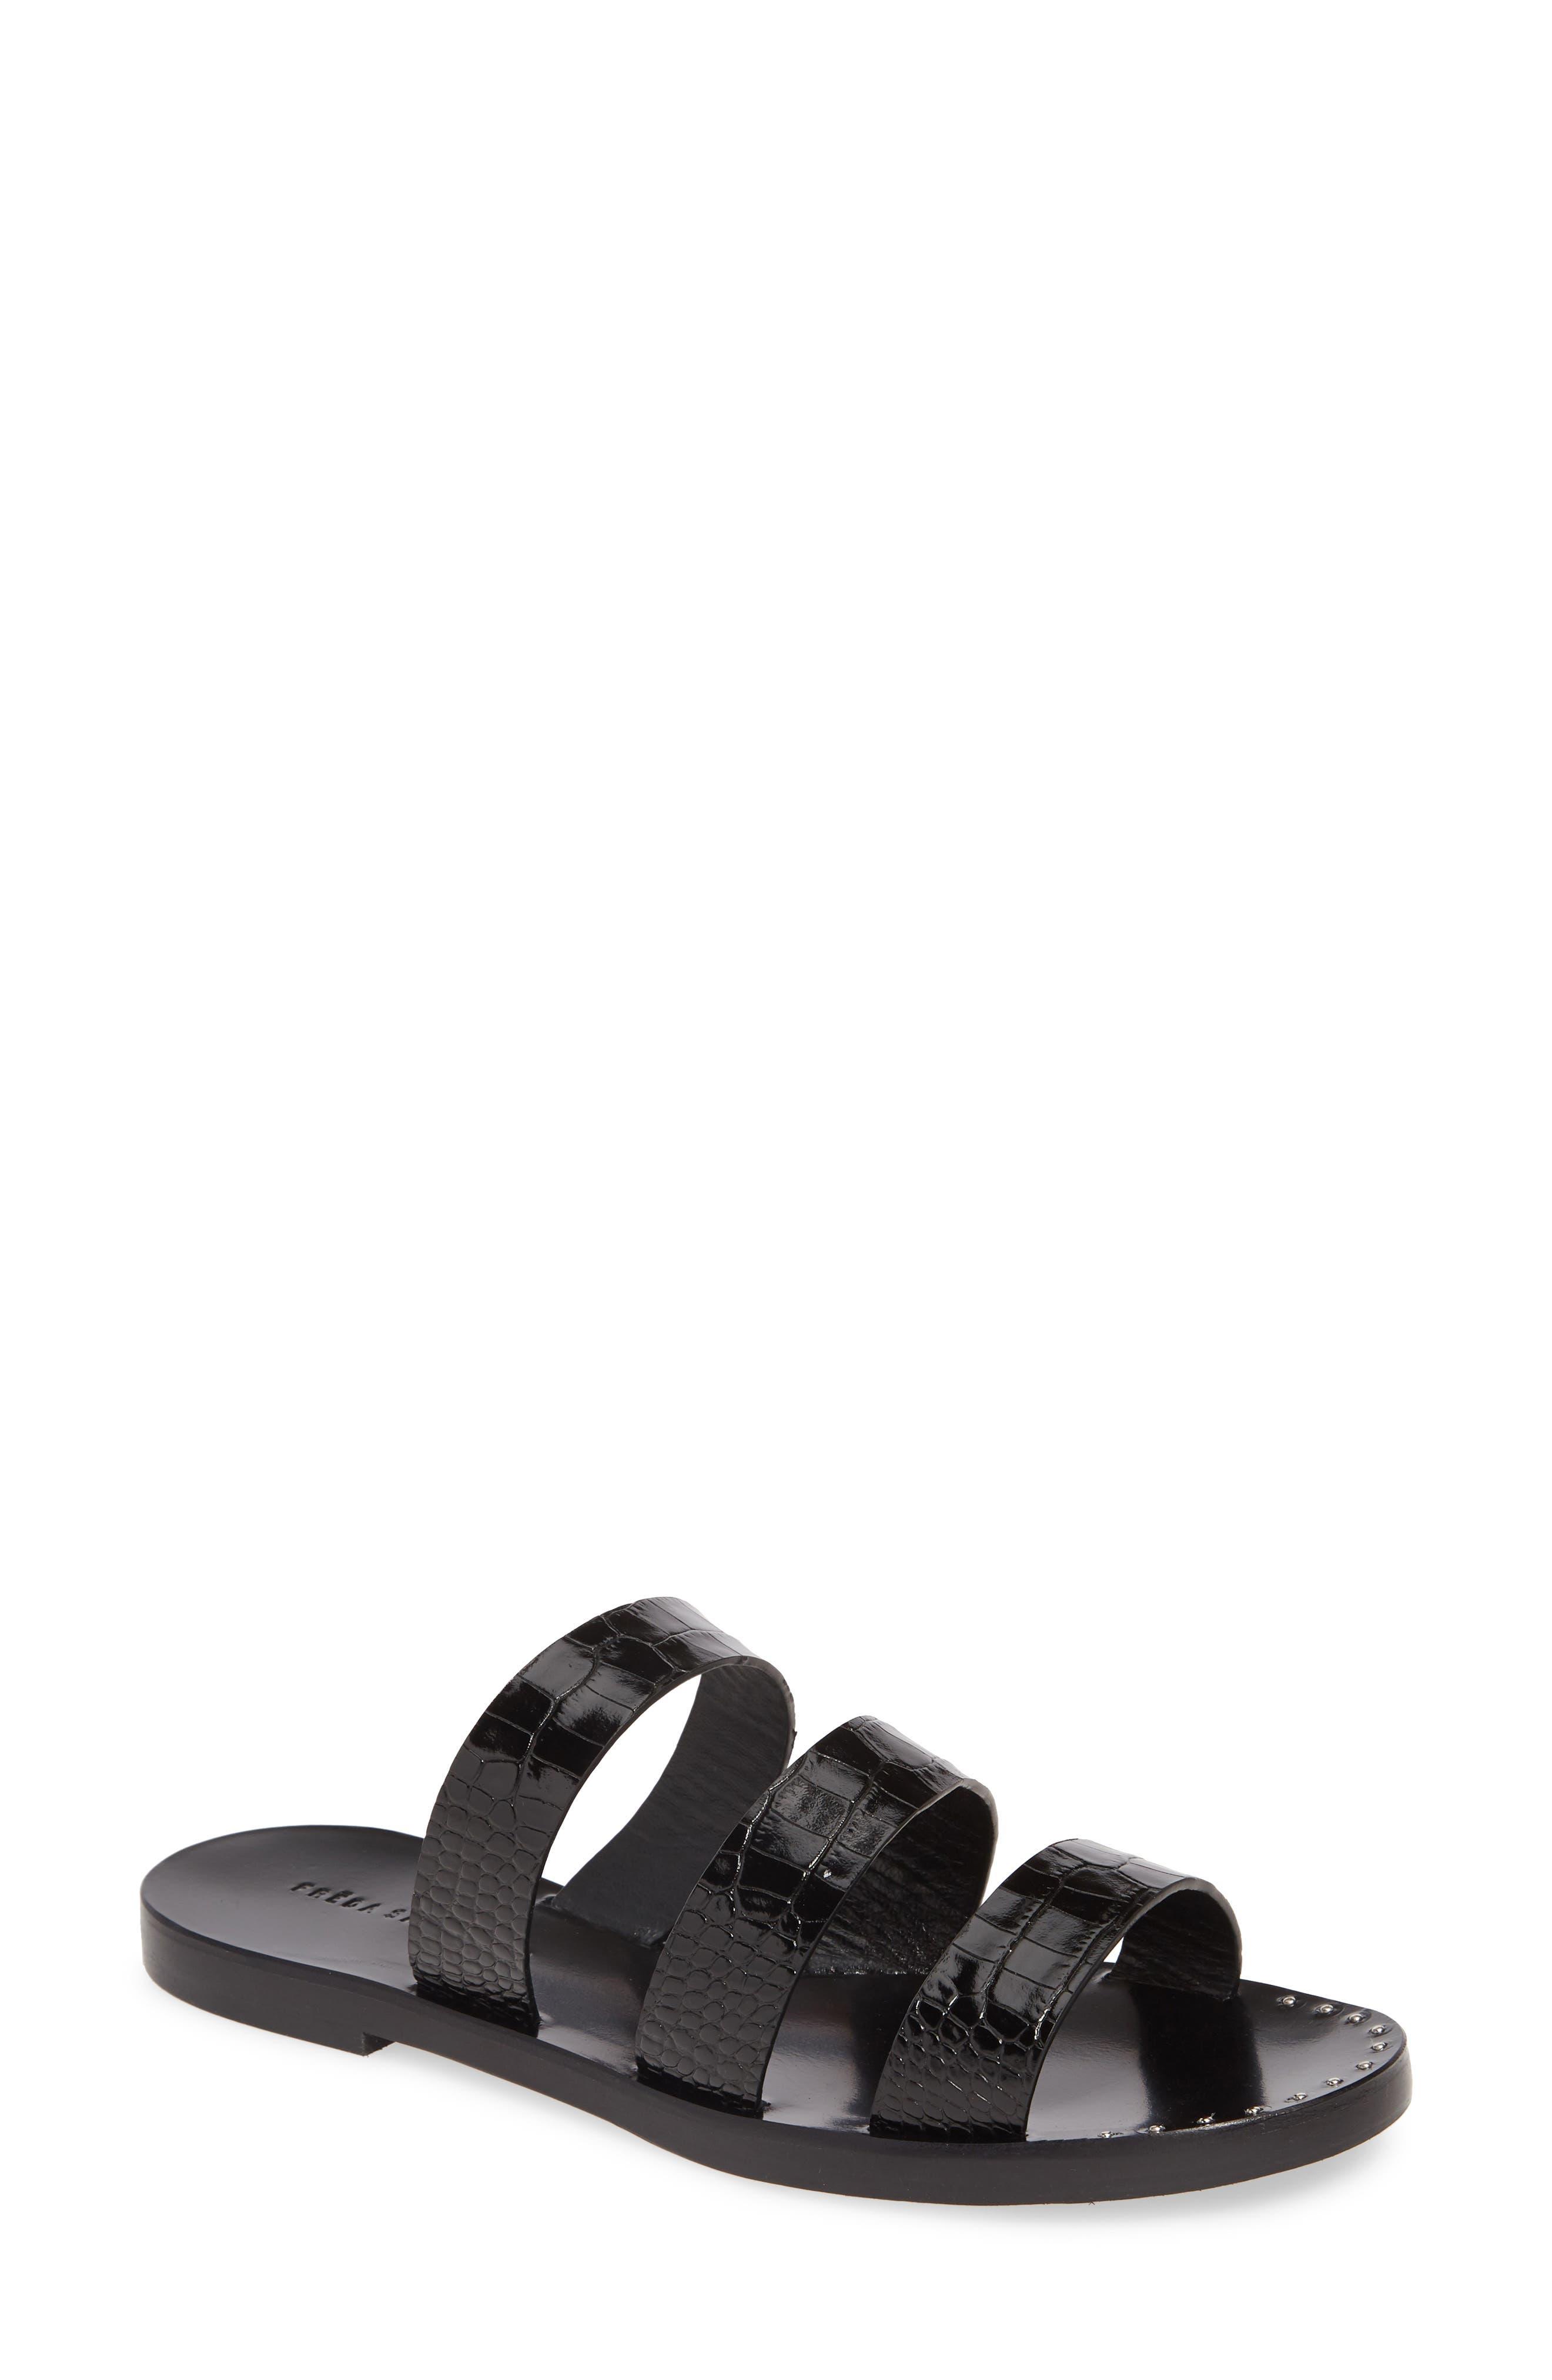 Image of FREDA SALVADOR Iris Embossed Leather Slide Sandal